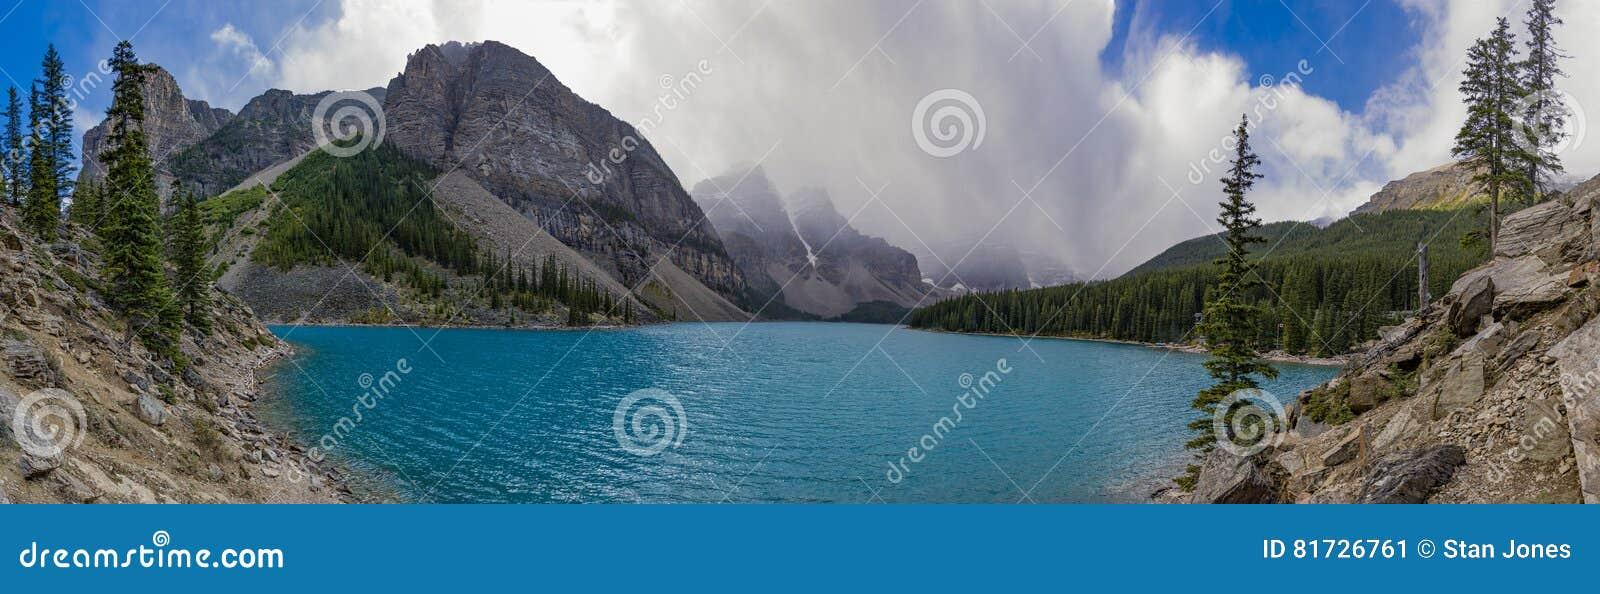 Panorama Morena jezioro w Banff parku narodowym Alberta Kanada